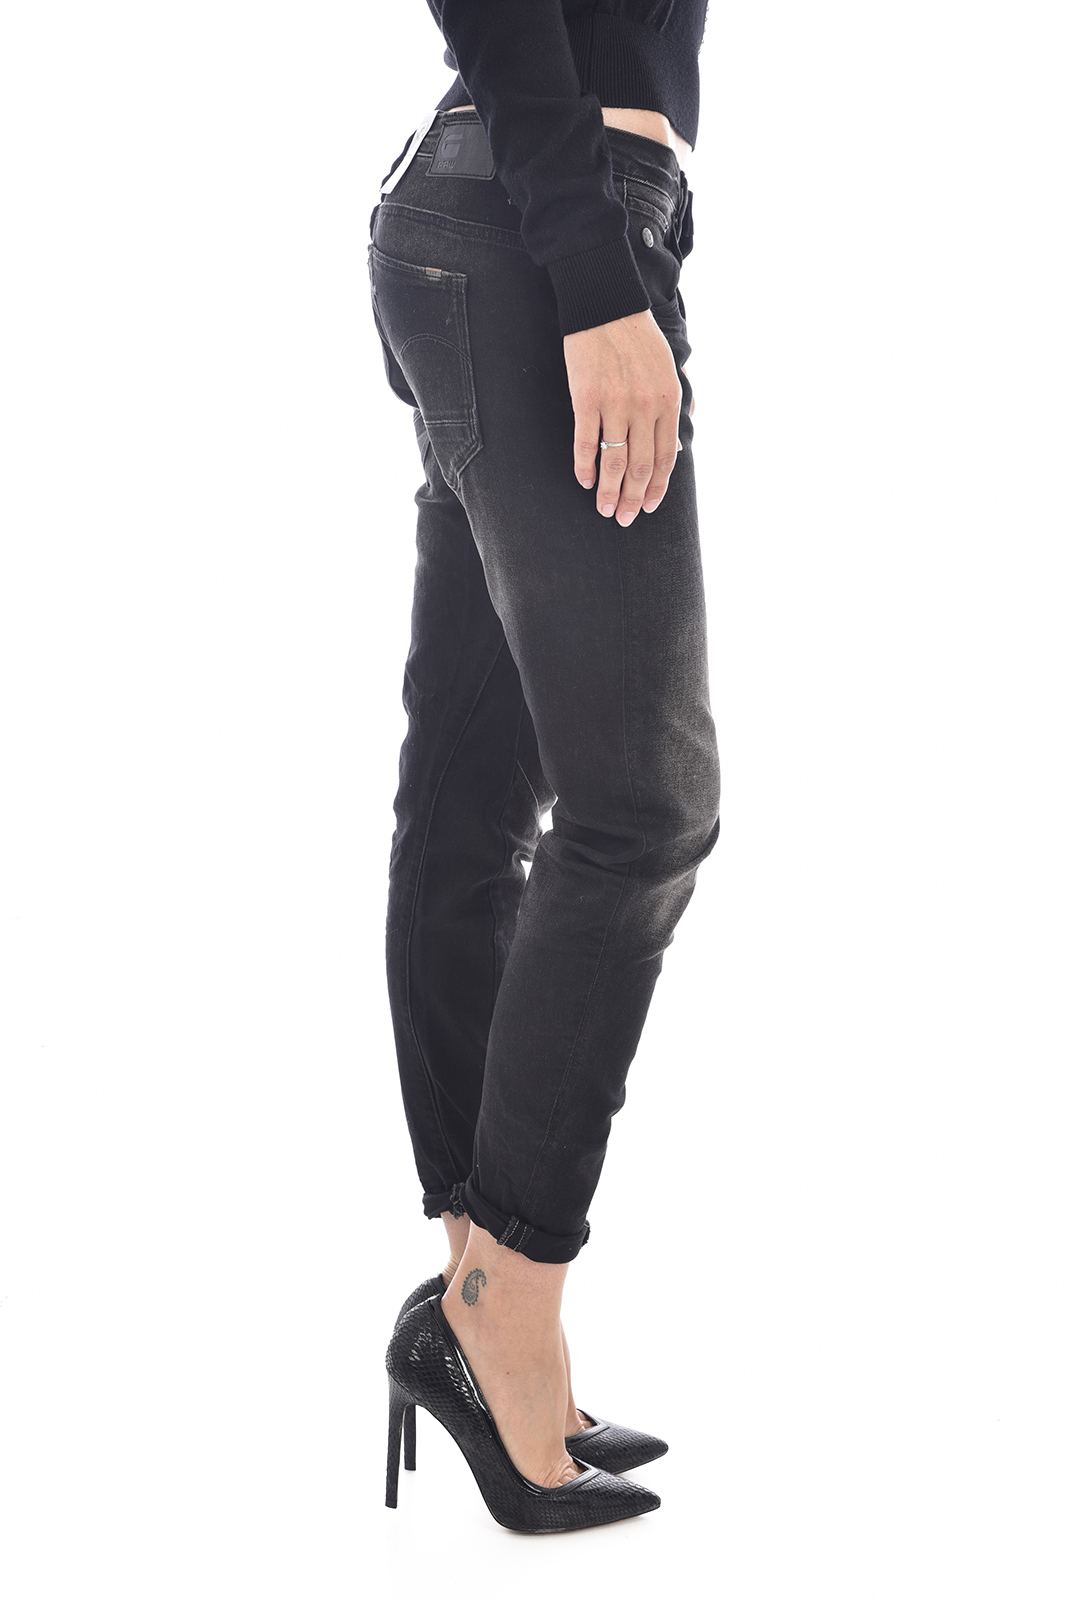 Jeans   G-star 60892-6544-89 arc noir